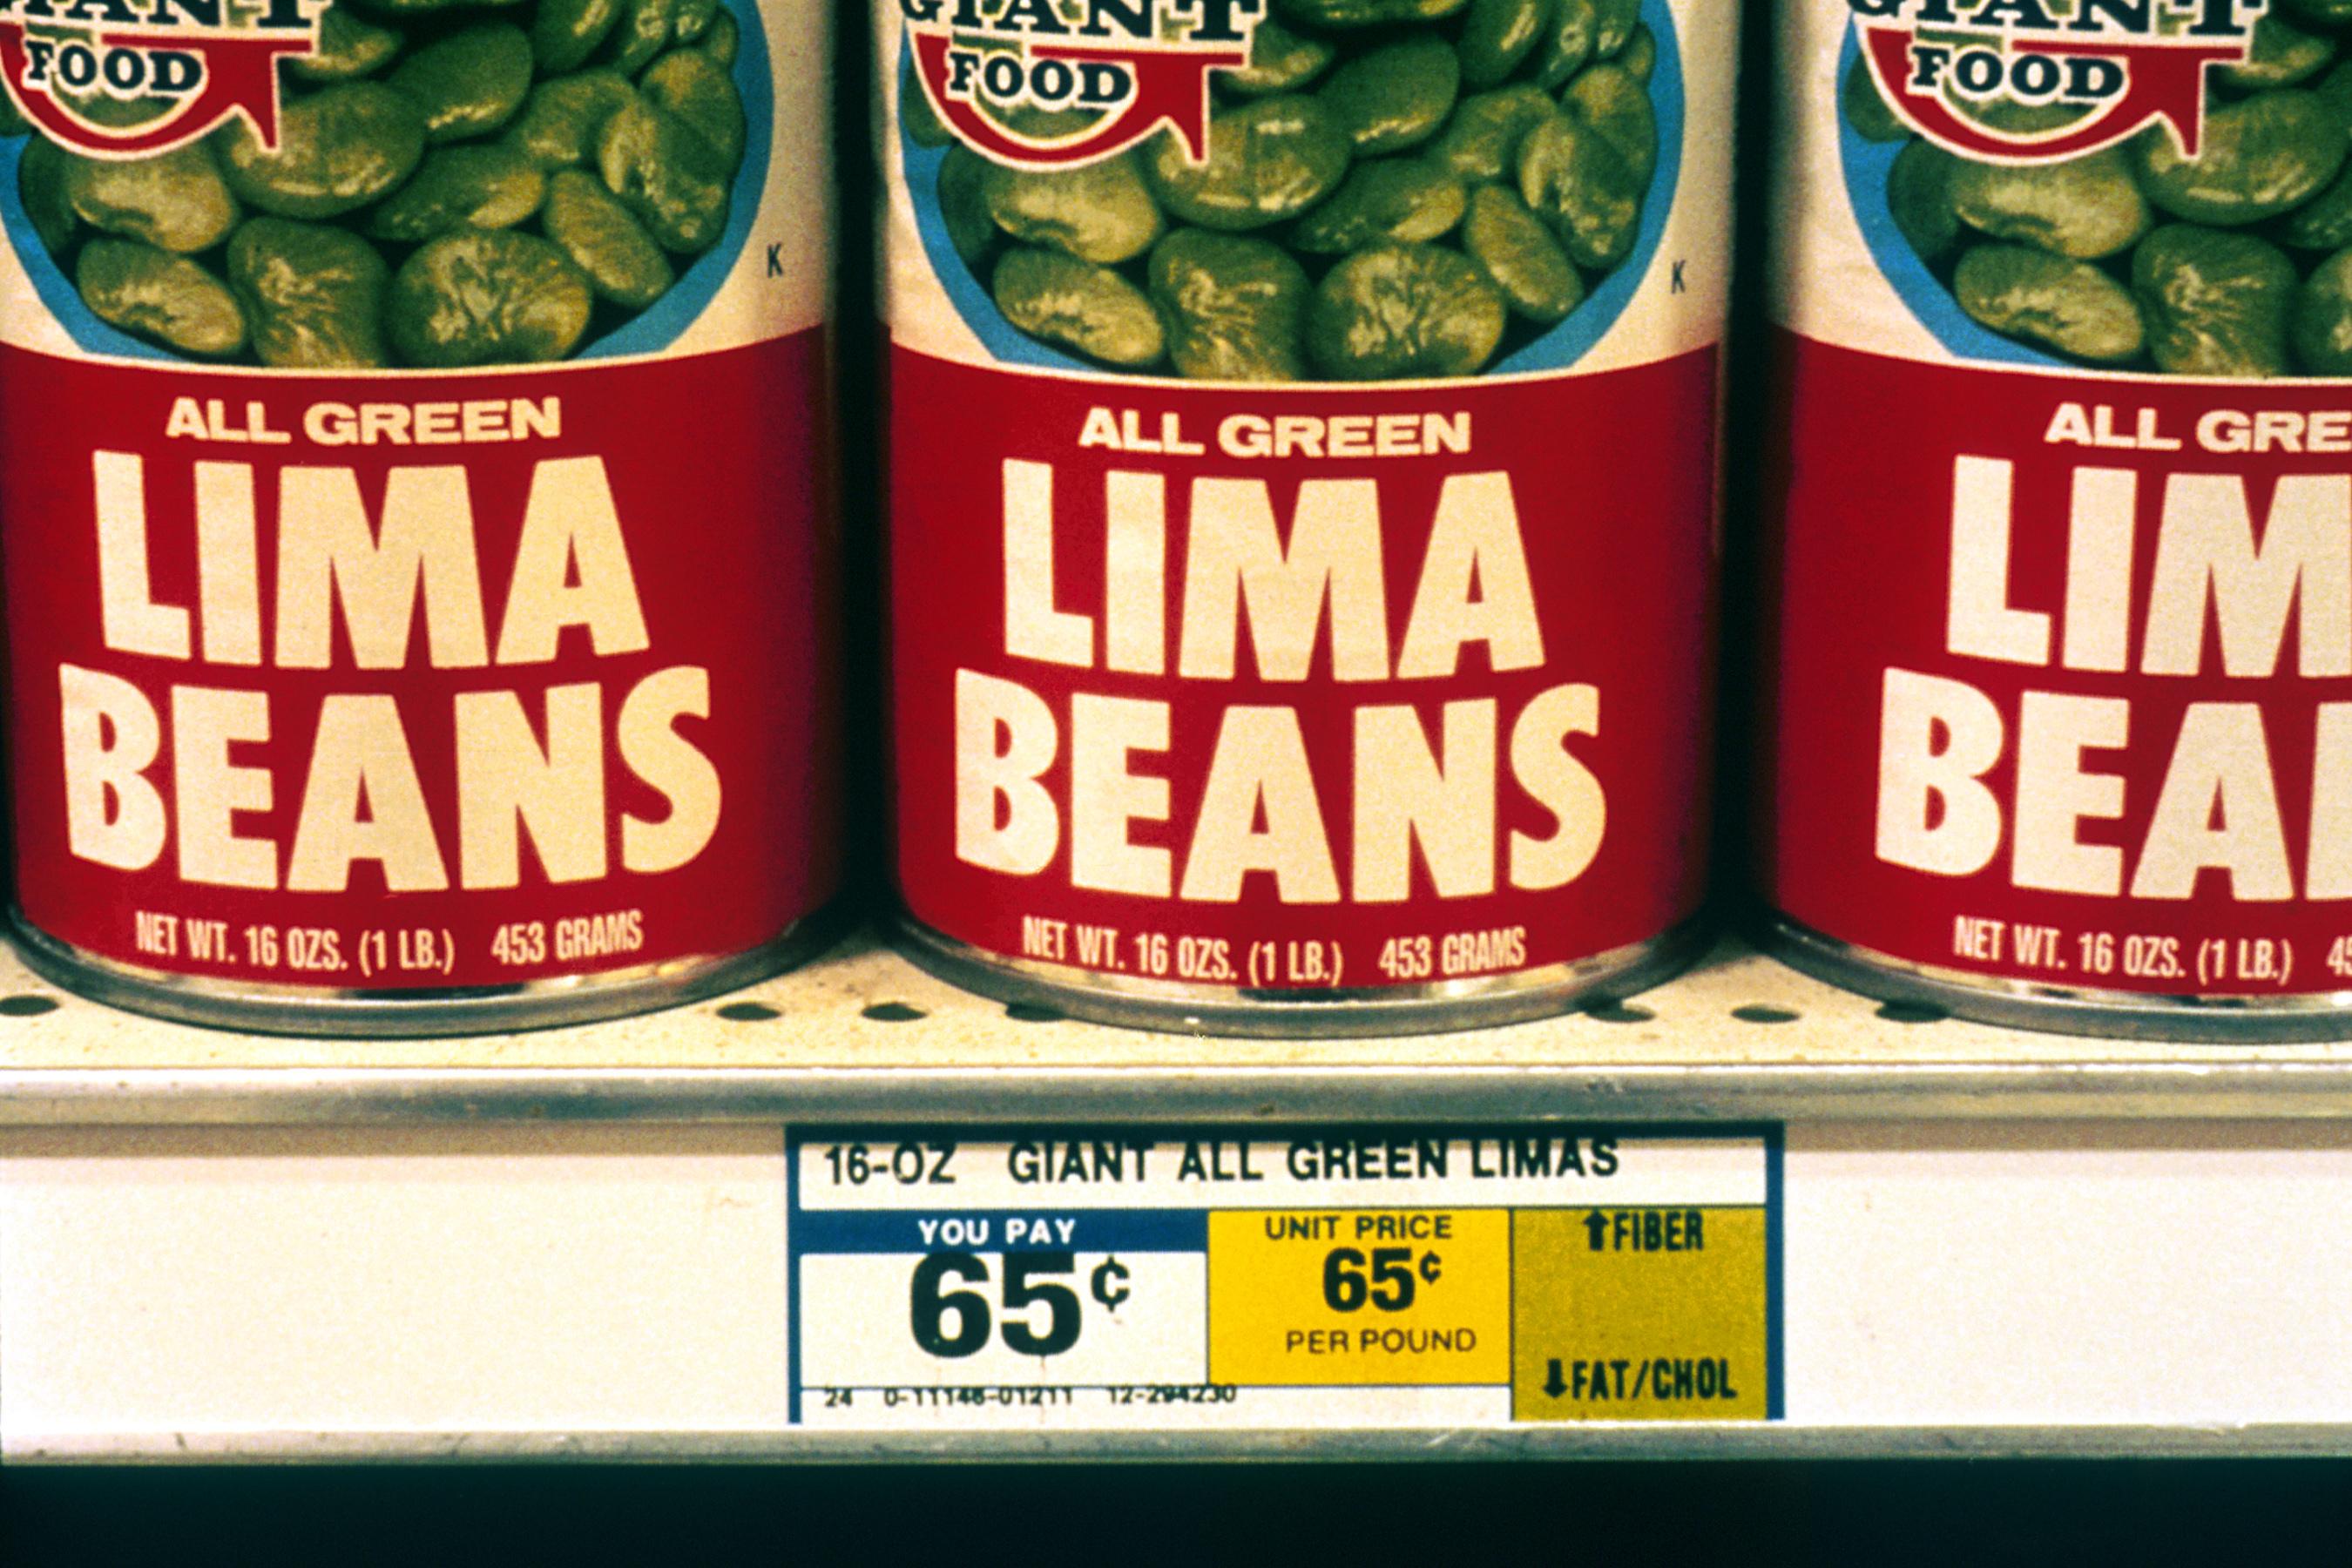 Image of Lima Bean